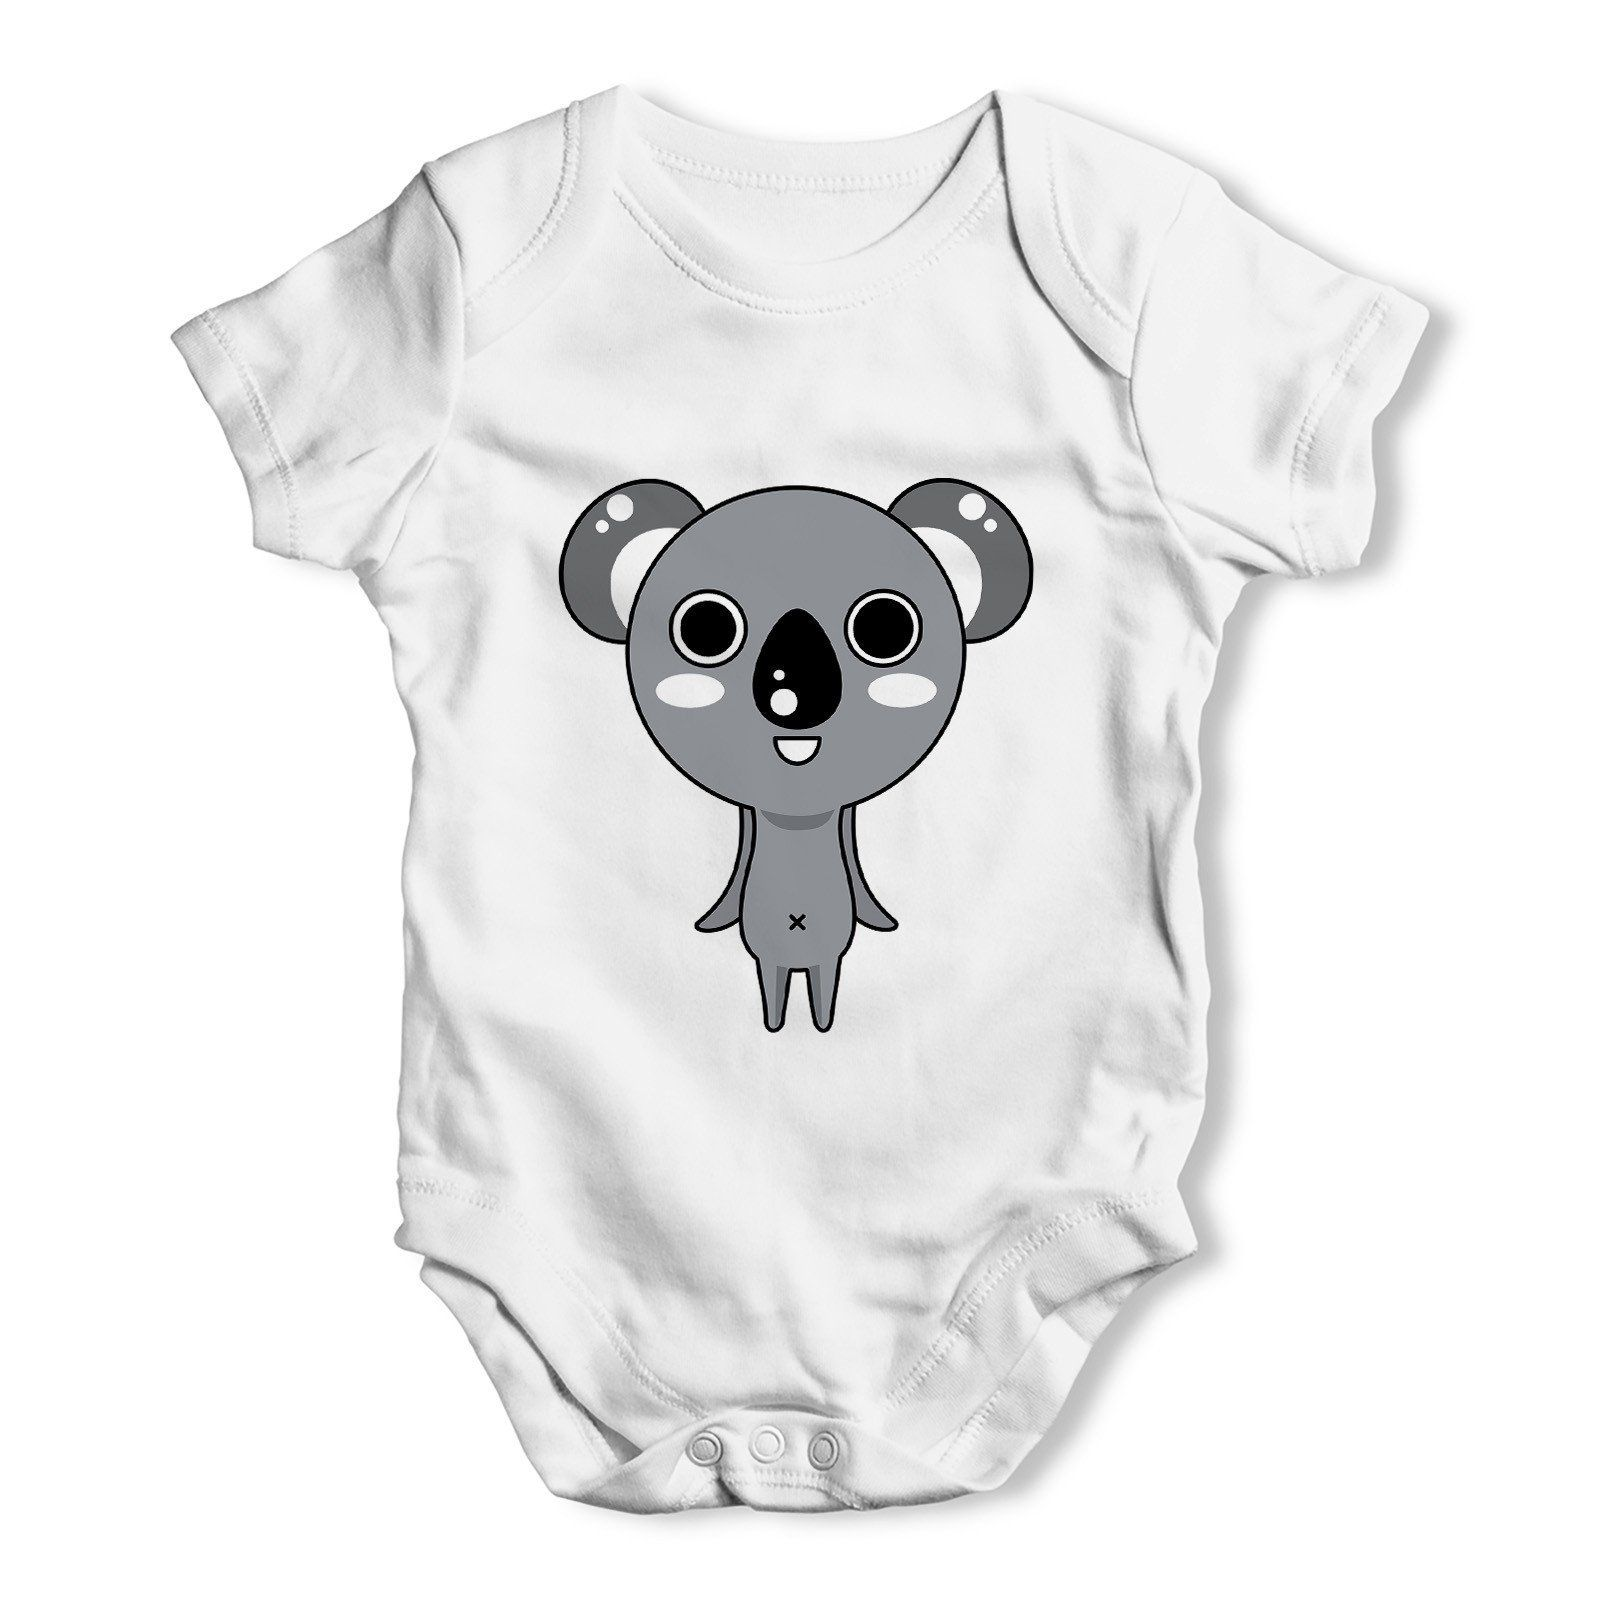 Cute Koala Baby Grow Bodysuit